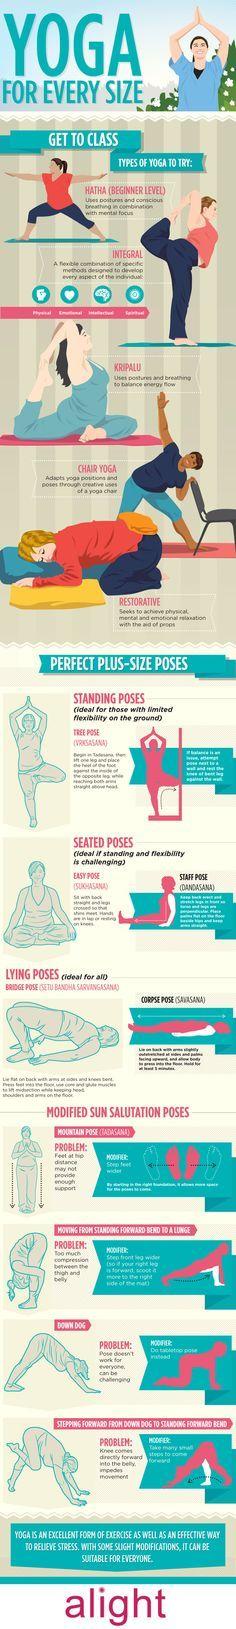 25+ best ideas about Plus Size Yoga on Pinterest | Plank fitness ...